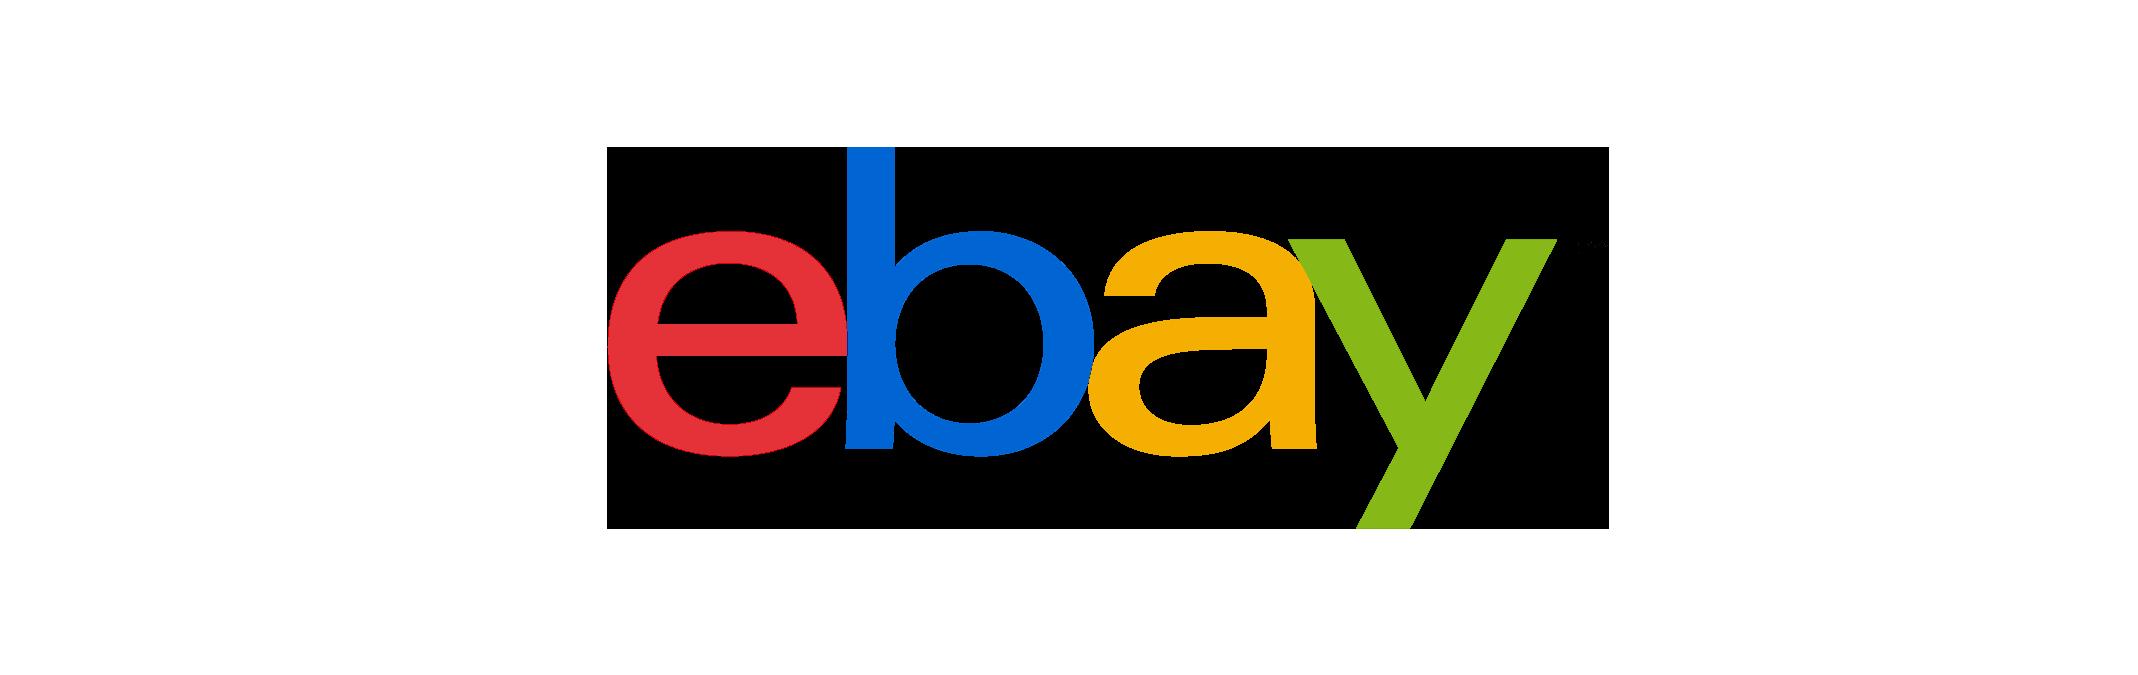 ebay payment logo